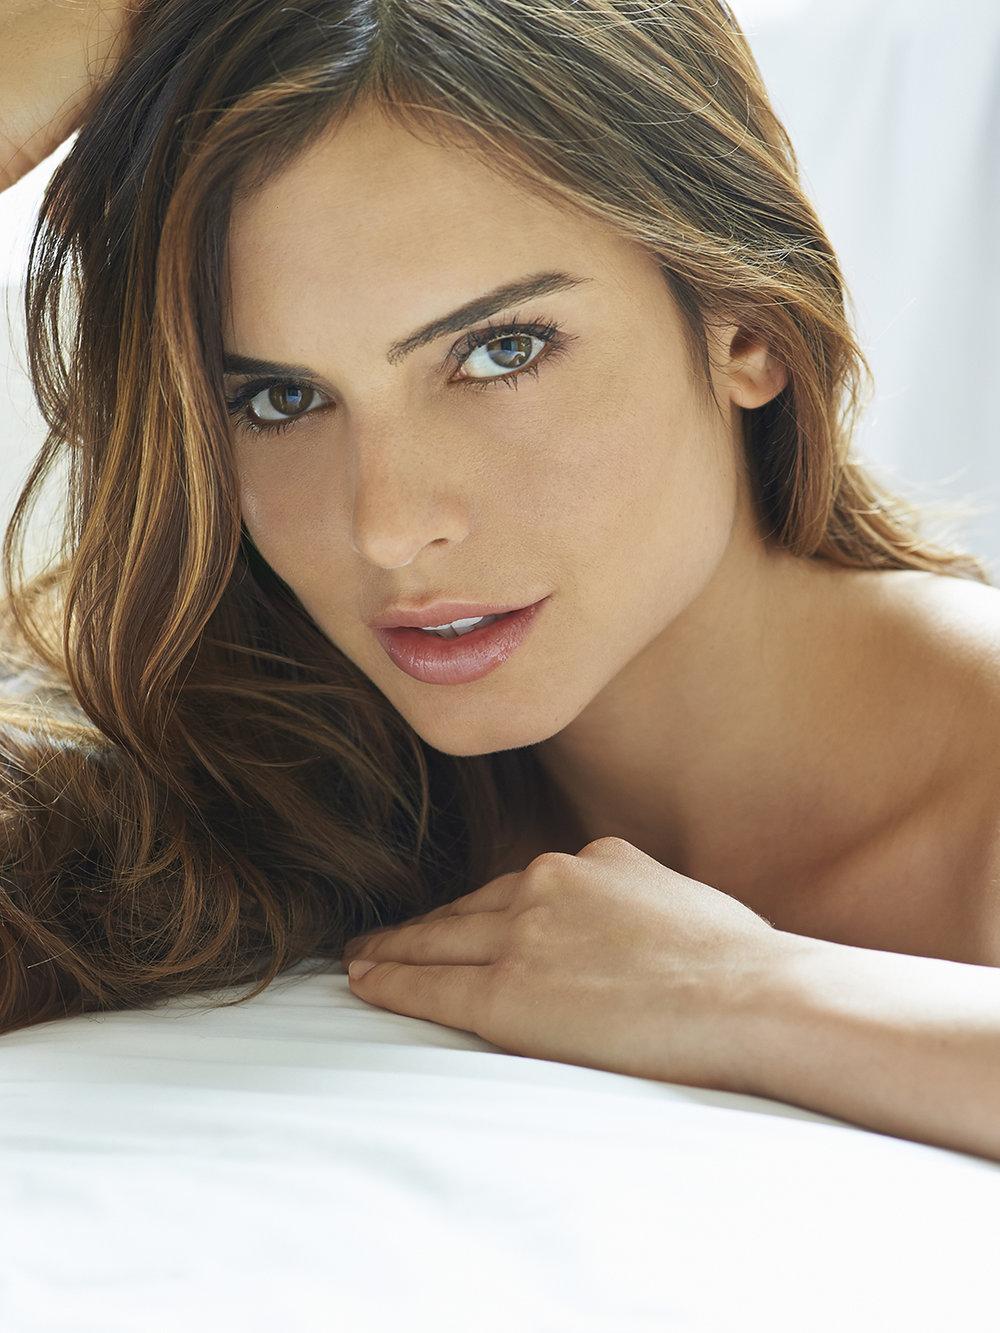 Harten_Nafziger_beauty_photographer_valeri_paumelle_agent (39).jpg